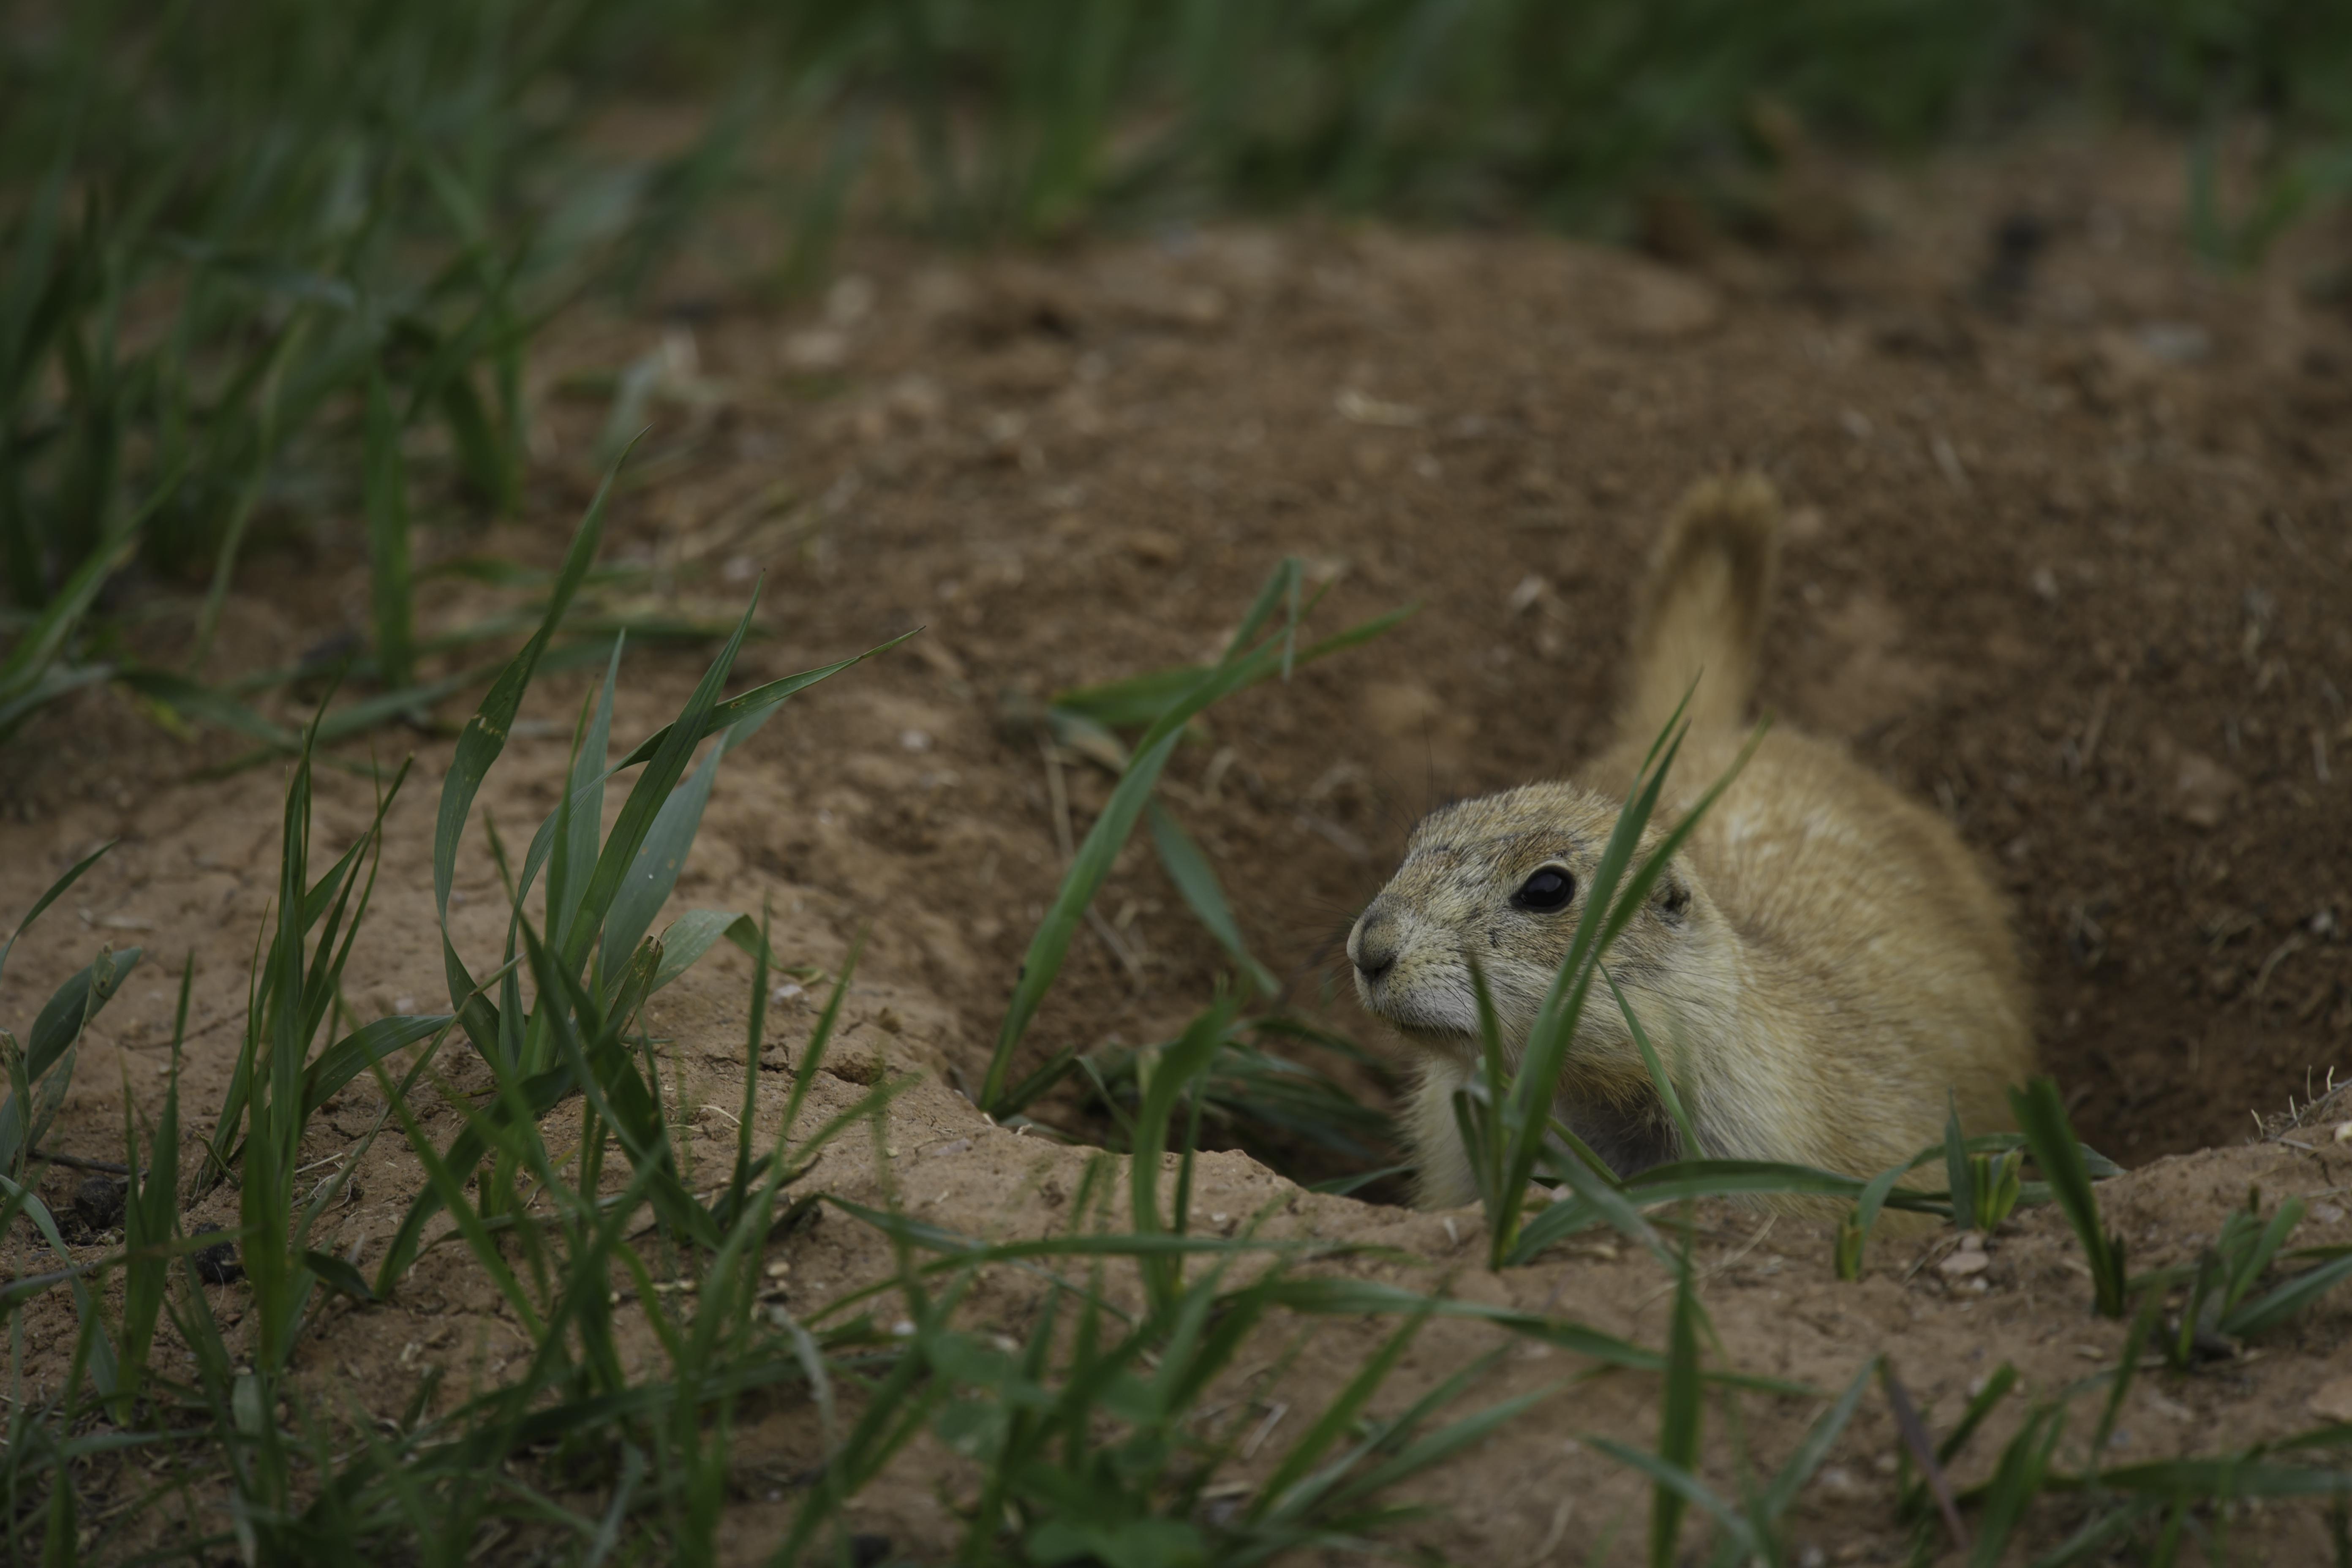 Prairie Dog in burrow